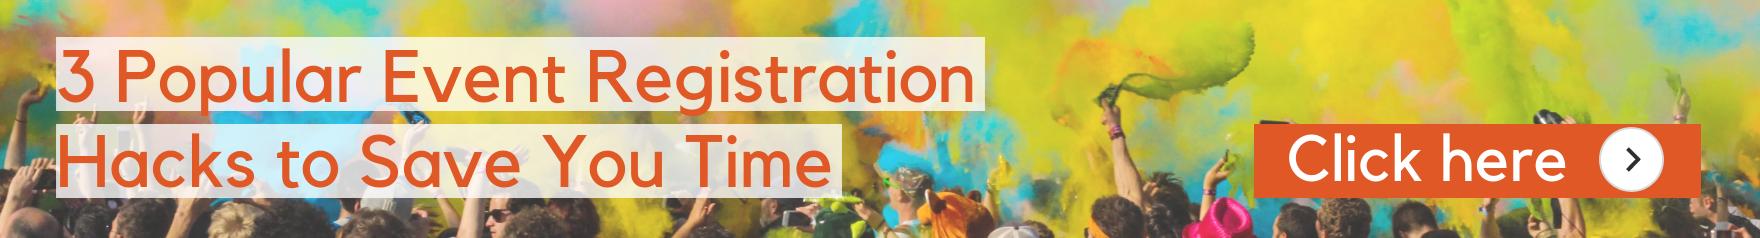 Integromat event registration banner